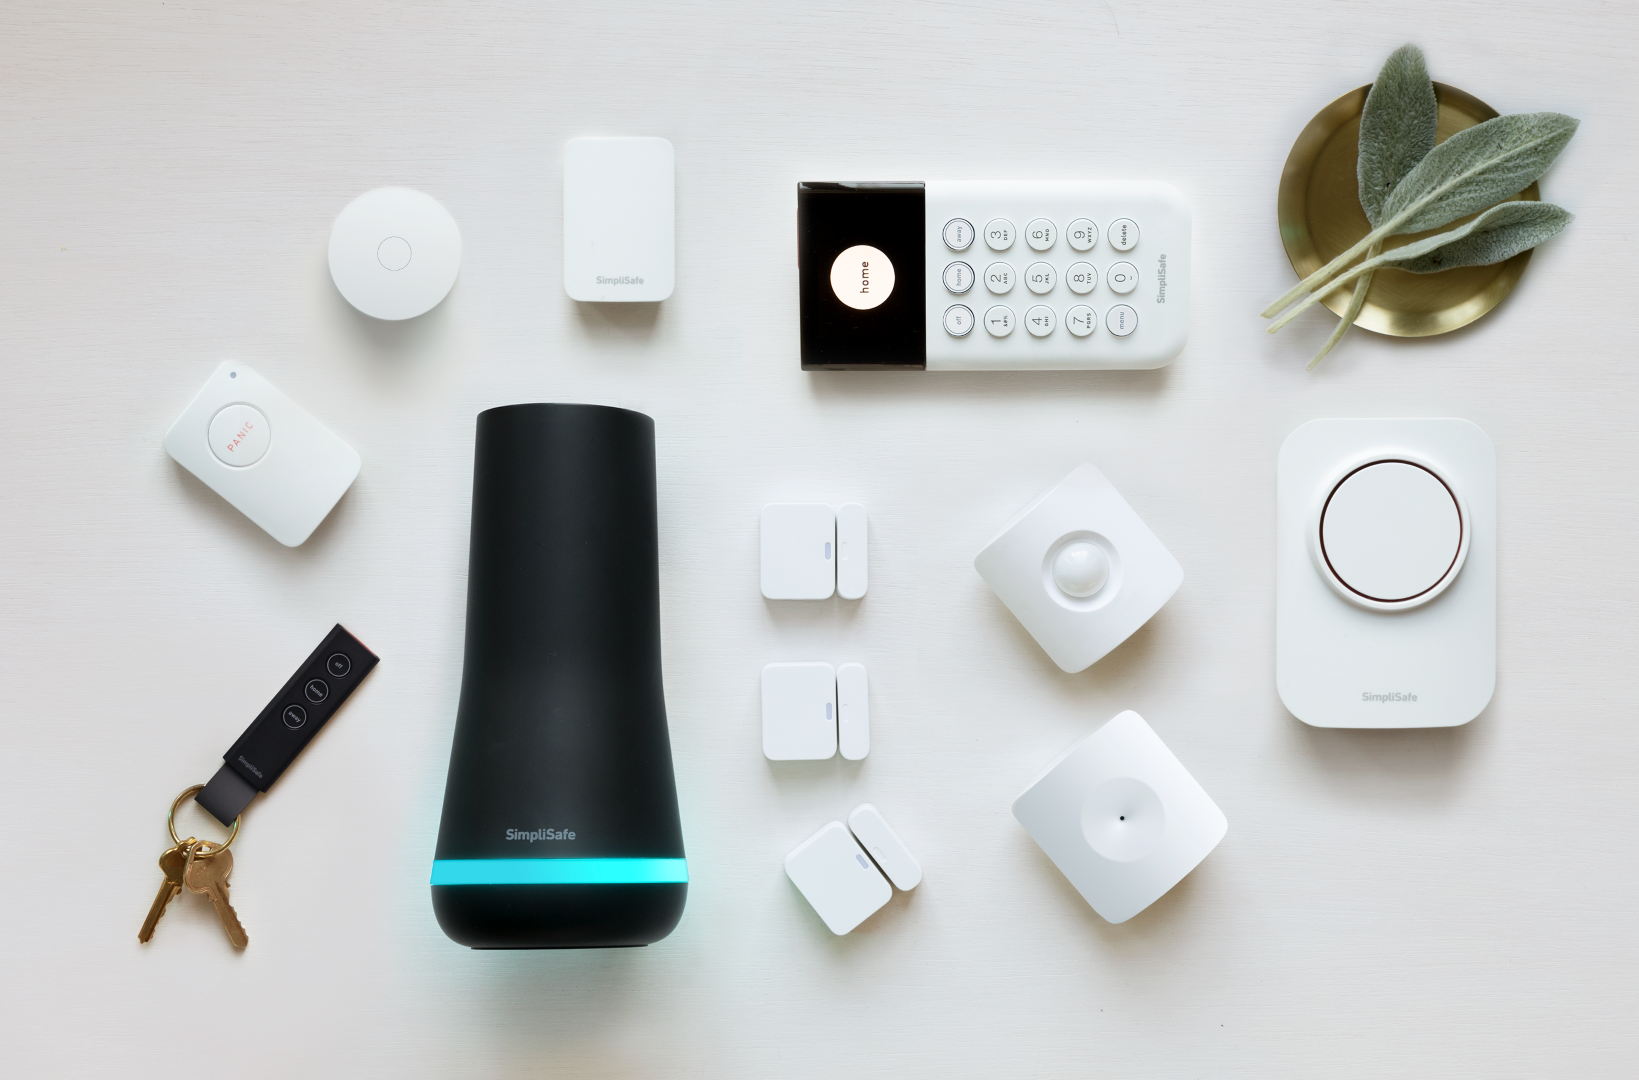 Ring Smart Alarm Vs Yale Sync Smart Home Alarm Vs Somfy Home Alarm Vs Simplisafe Vs Netatmo Which Is The Best Smart Alarm In The Uk Mighty Gadget Blog Uk